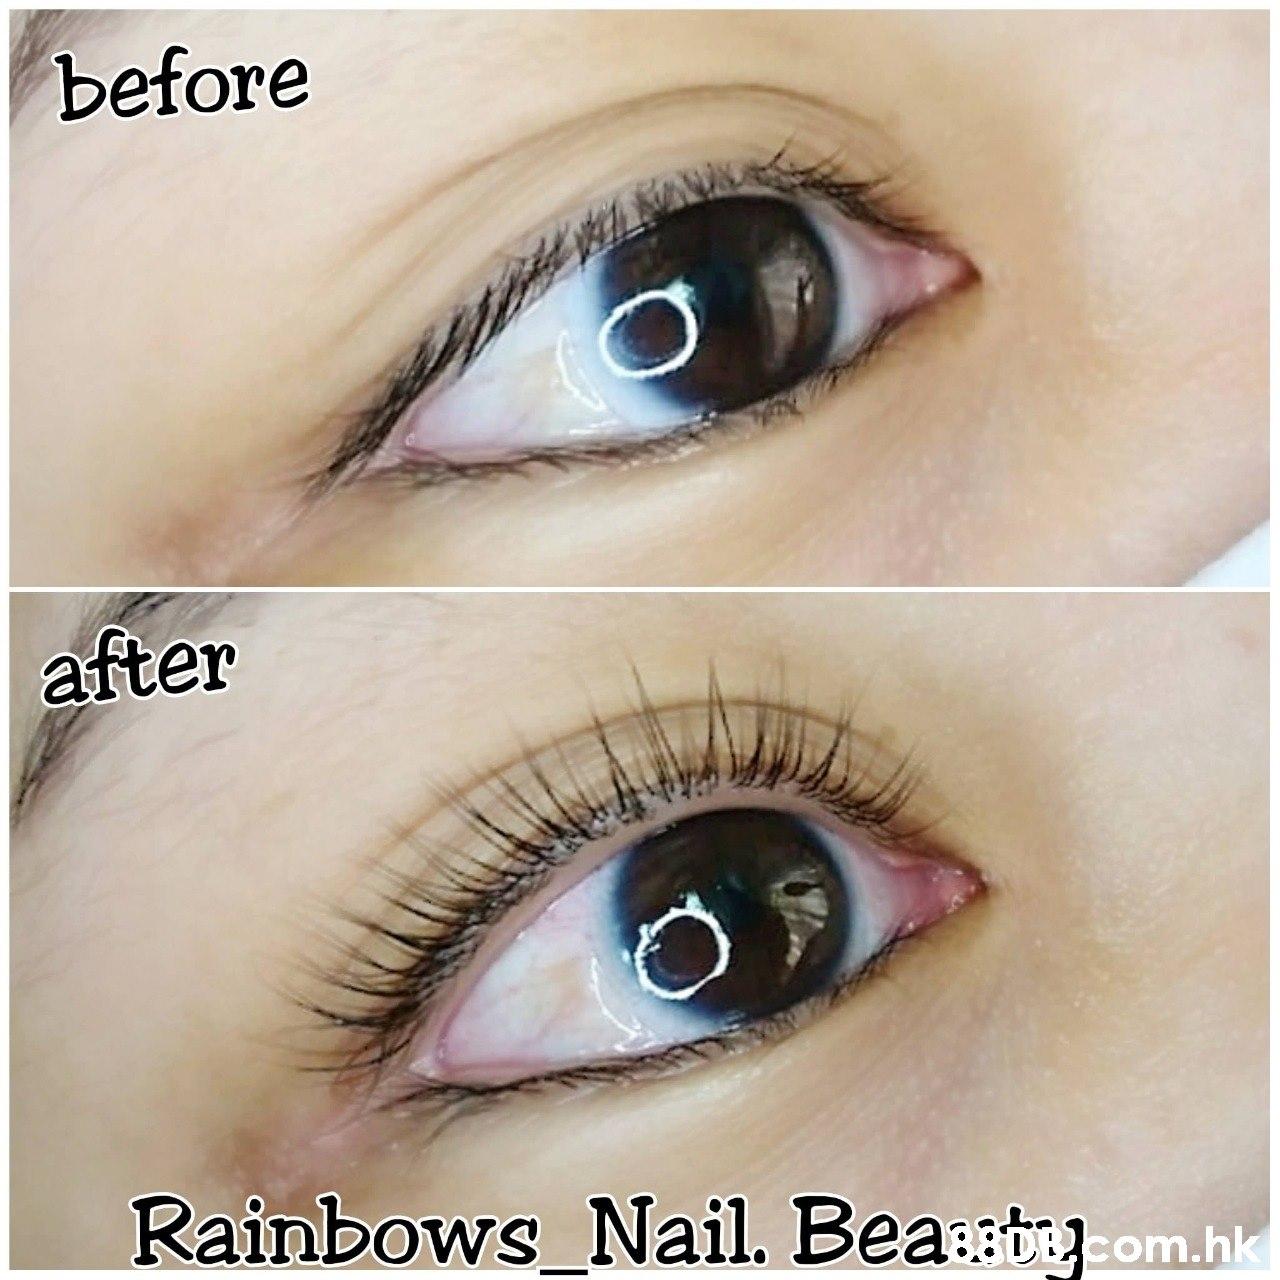 before after Rainbows-Nail. Beast om.hk  Eyebrow,Eyelash,Eye,Face,Skin